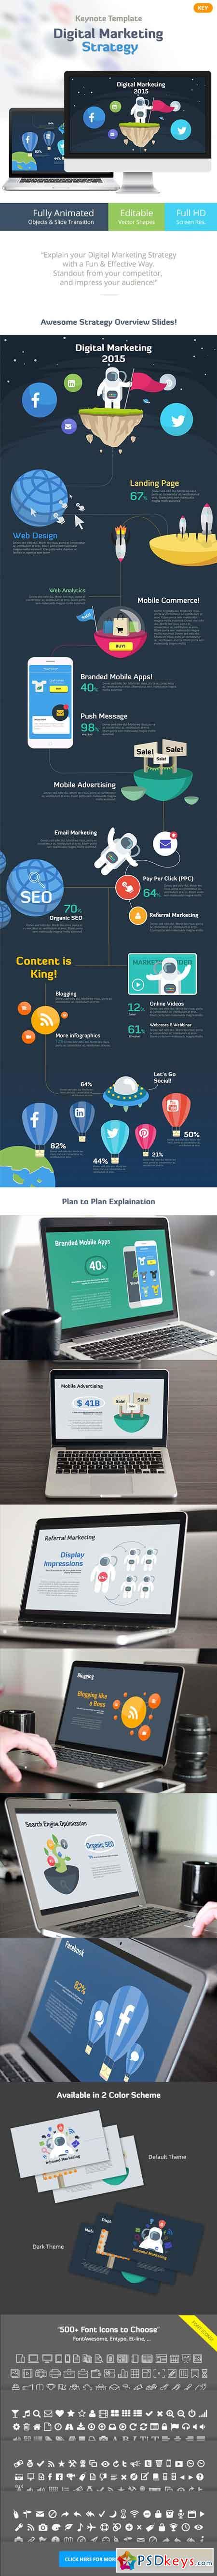 Digital Marketing Strategy - Keynote Template 10629253